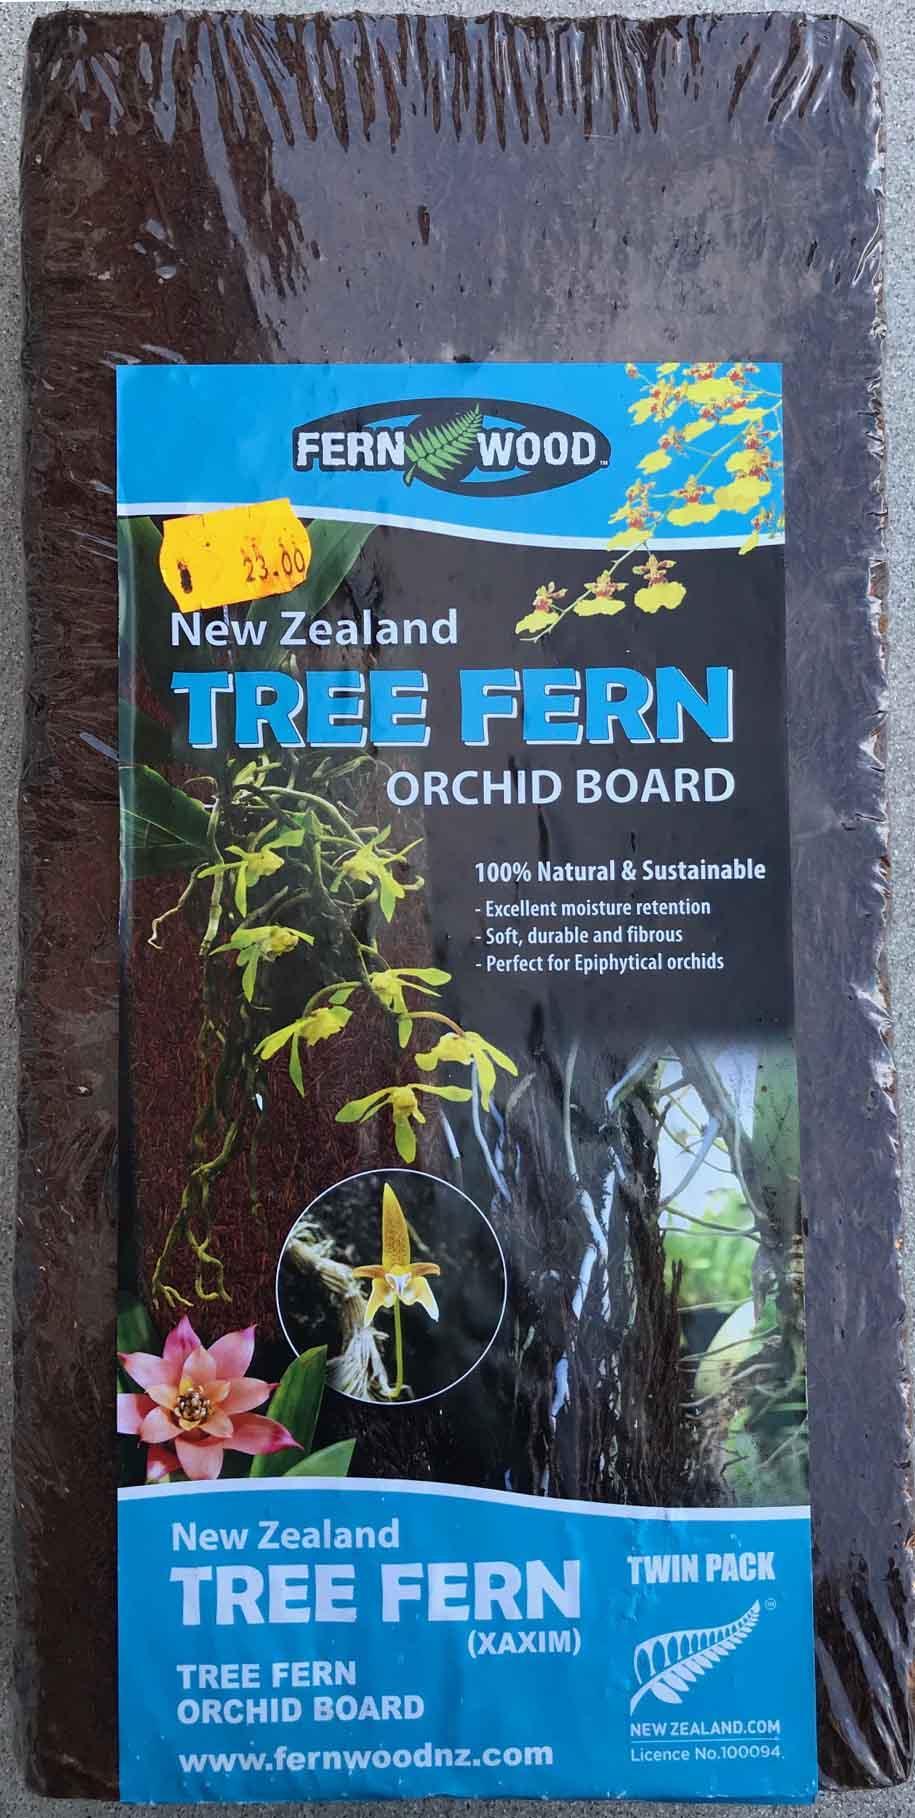 Fernwood Tree Fern plancha 30 x 15 x 2,5 cm pack de 2 unidades